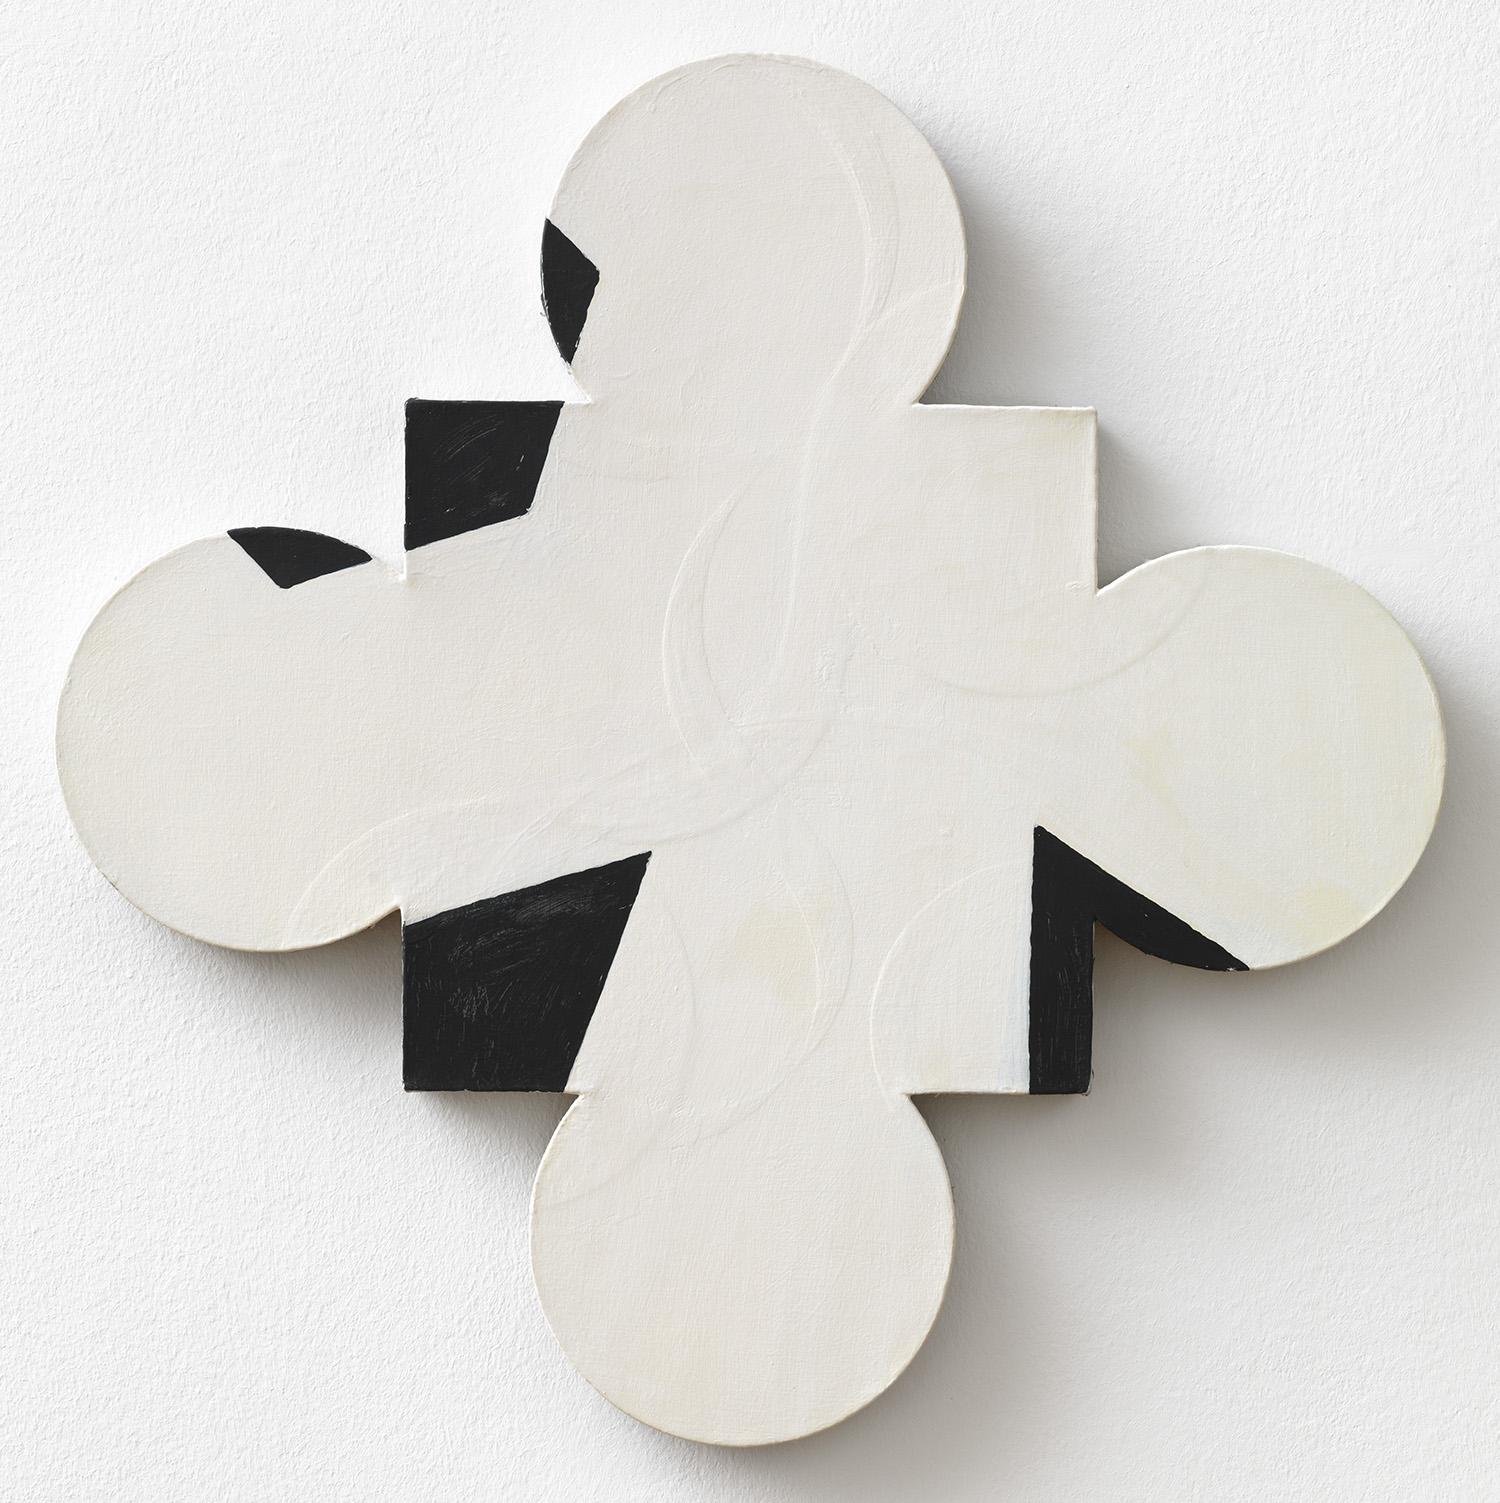 o.T. | 1988-2007 | Acryl auf Leinwand auf Holzgestell | 73 x 73 cm